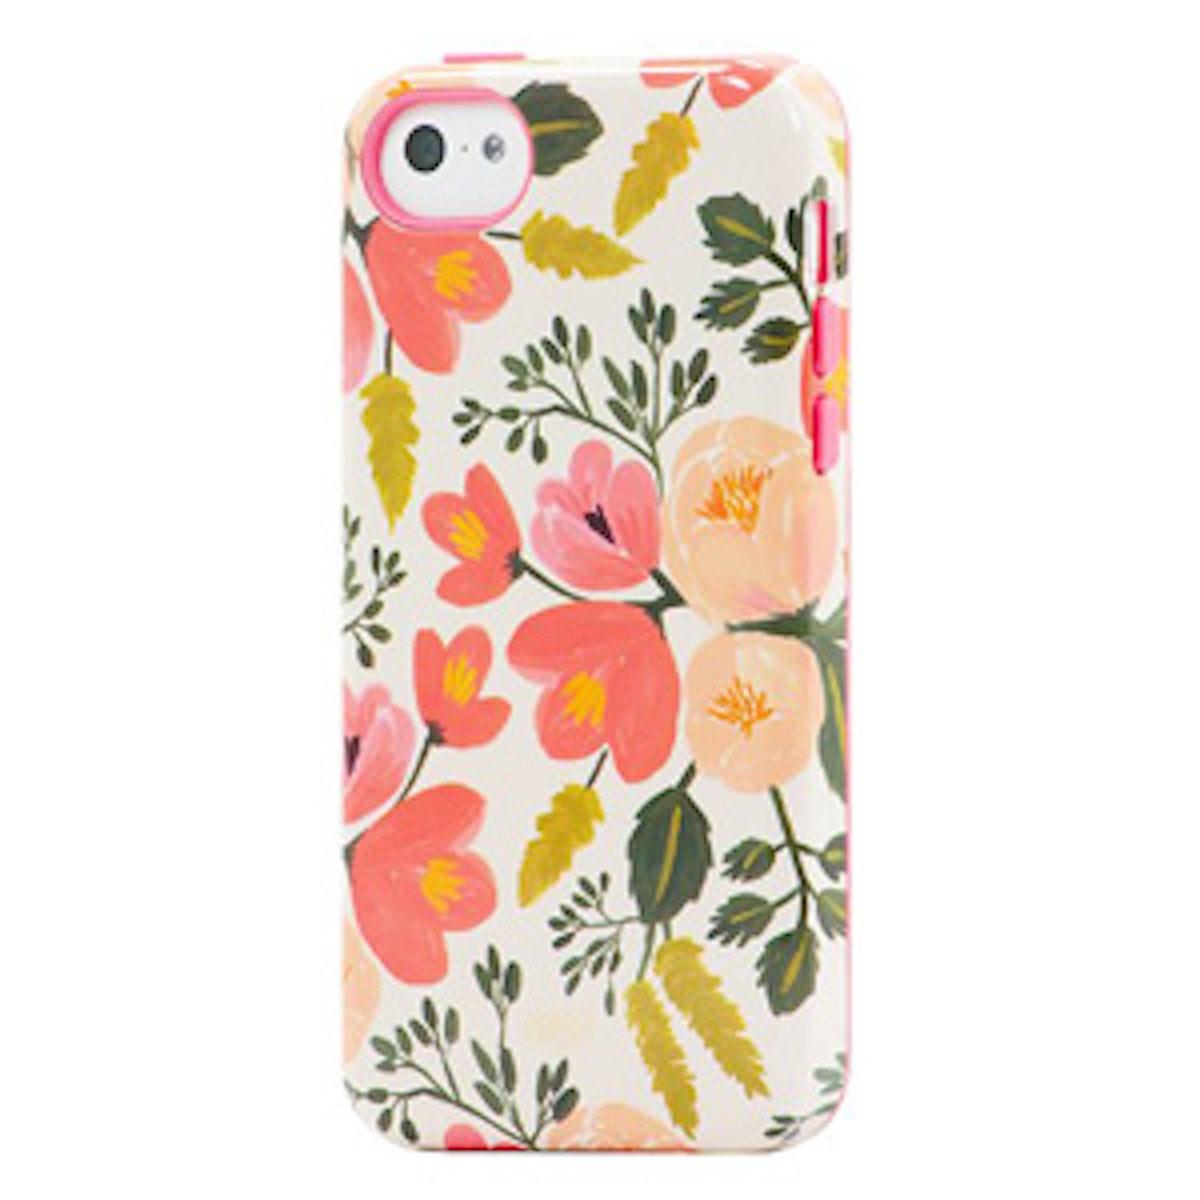 Botanical Rose iPhone 5/5S Case